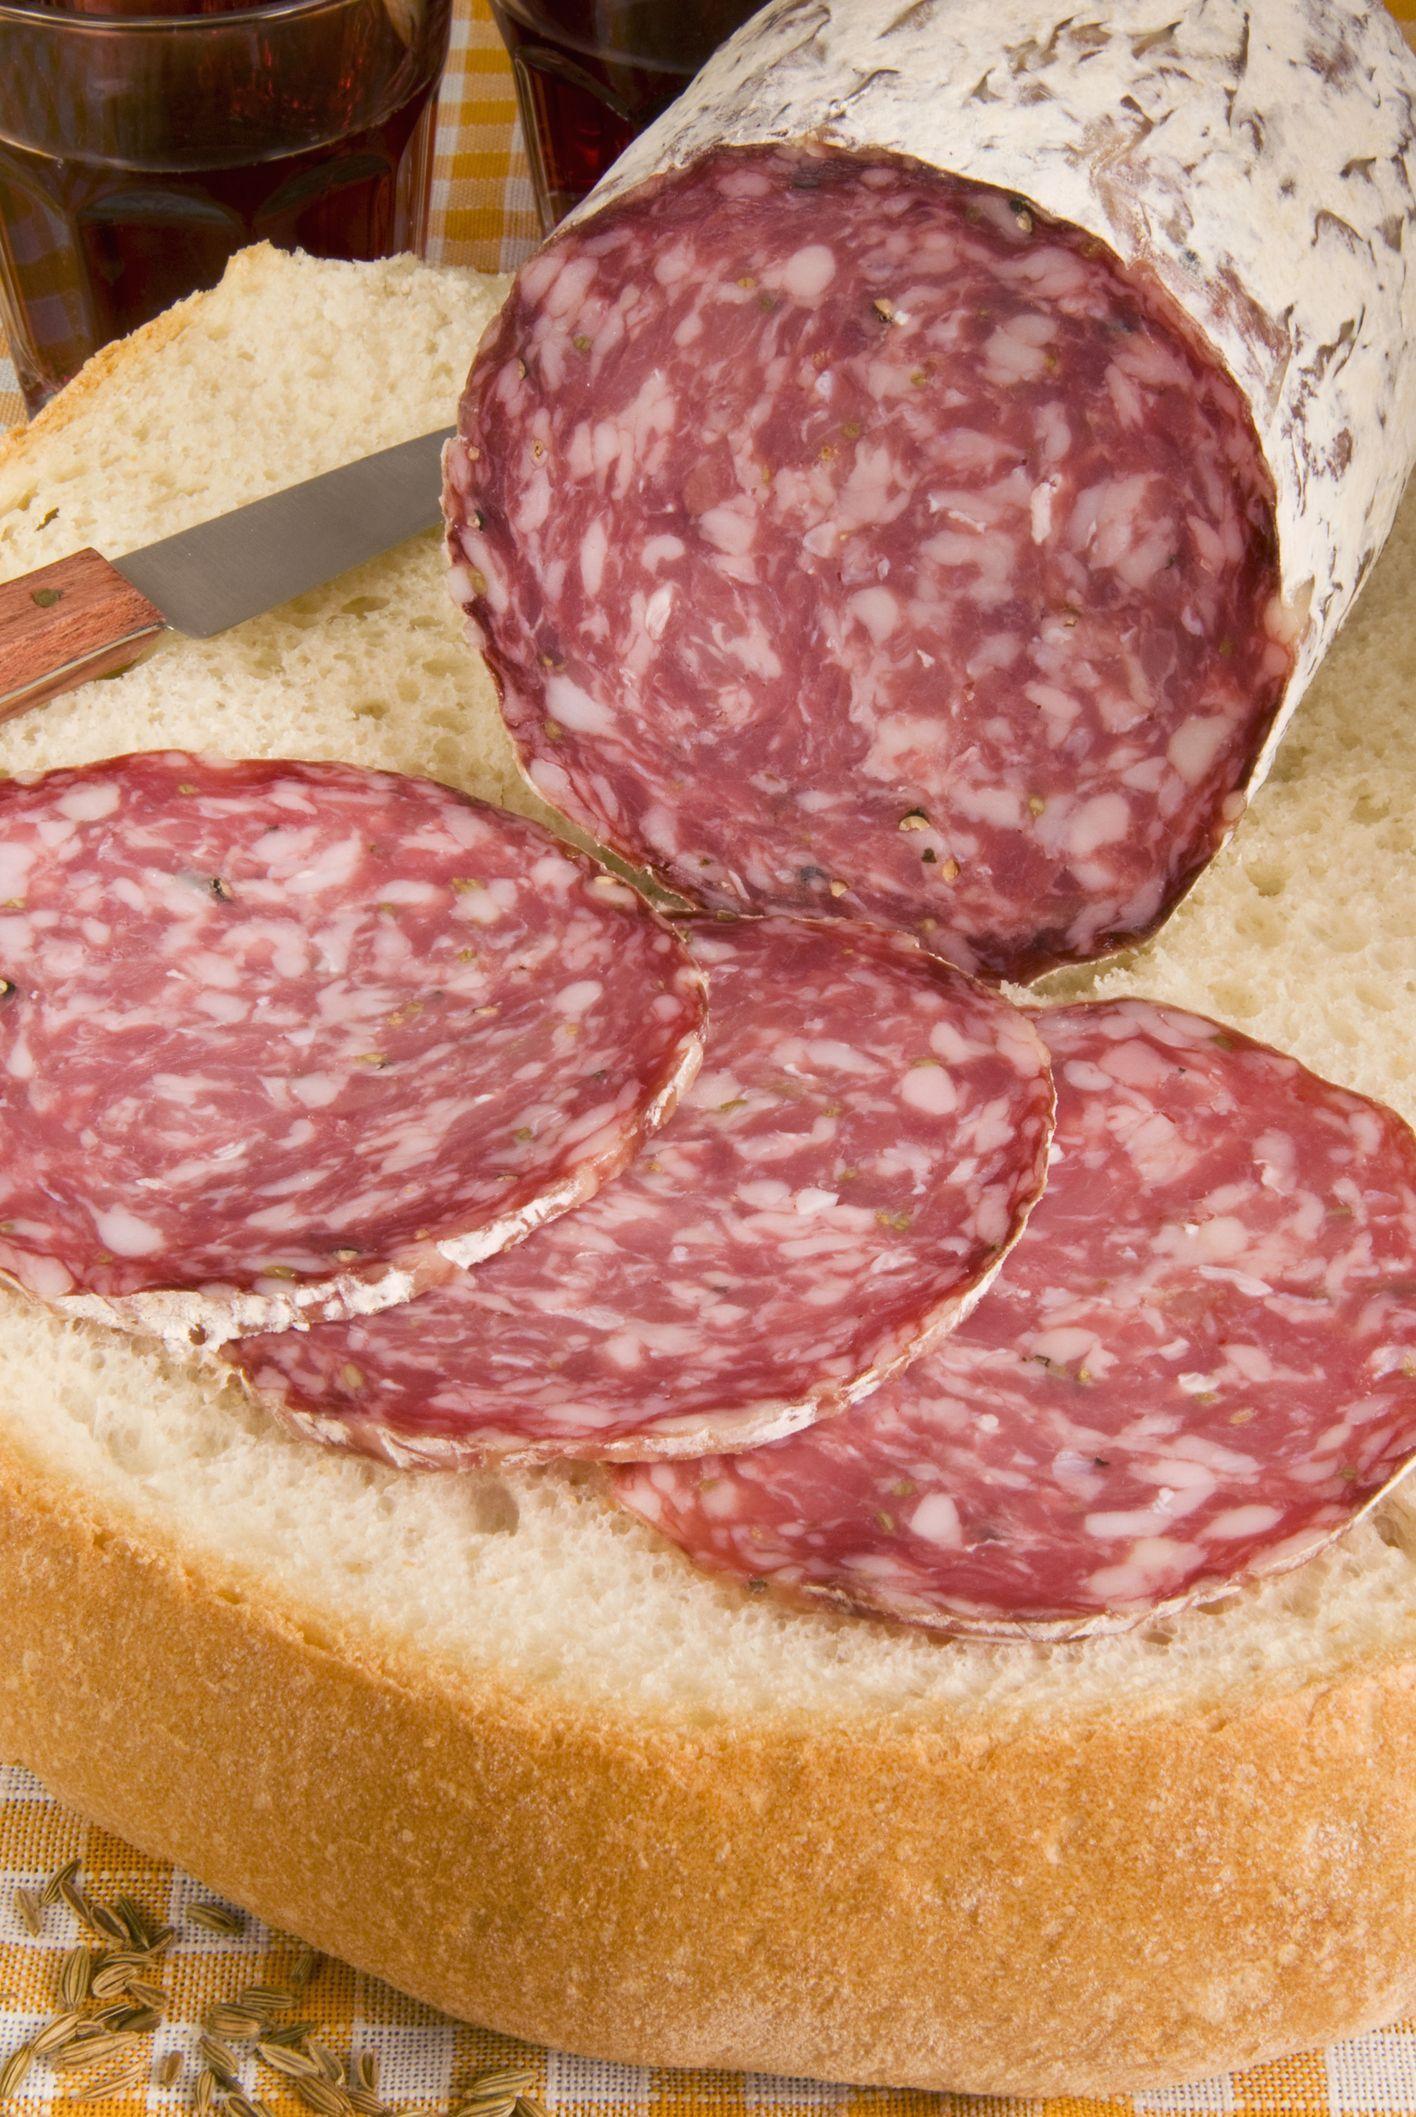 How To Make Tuscan Finocchiona Salami Recipe Homemade Sausage Recipes Cured Meats Italian Salami